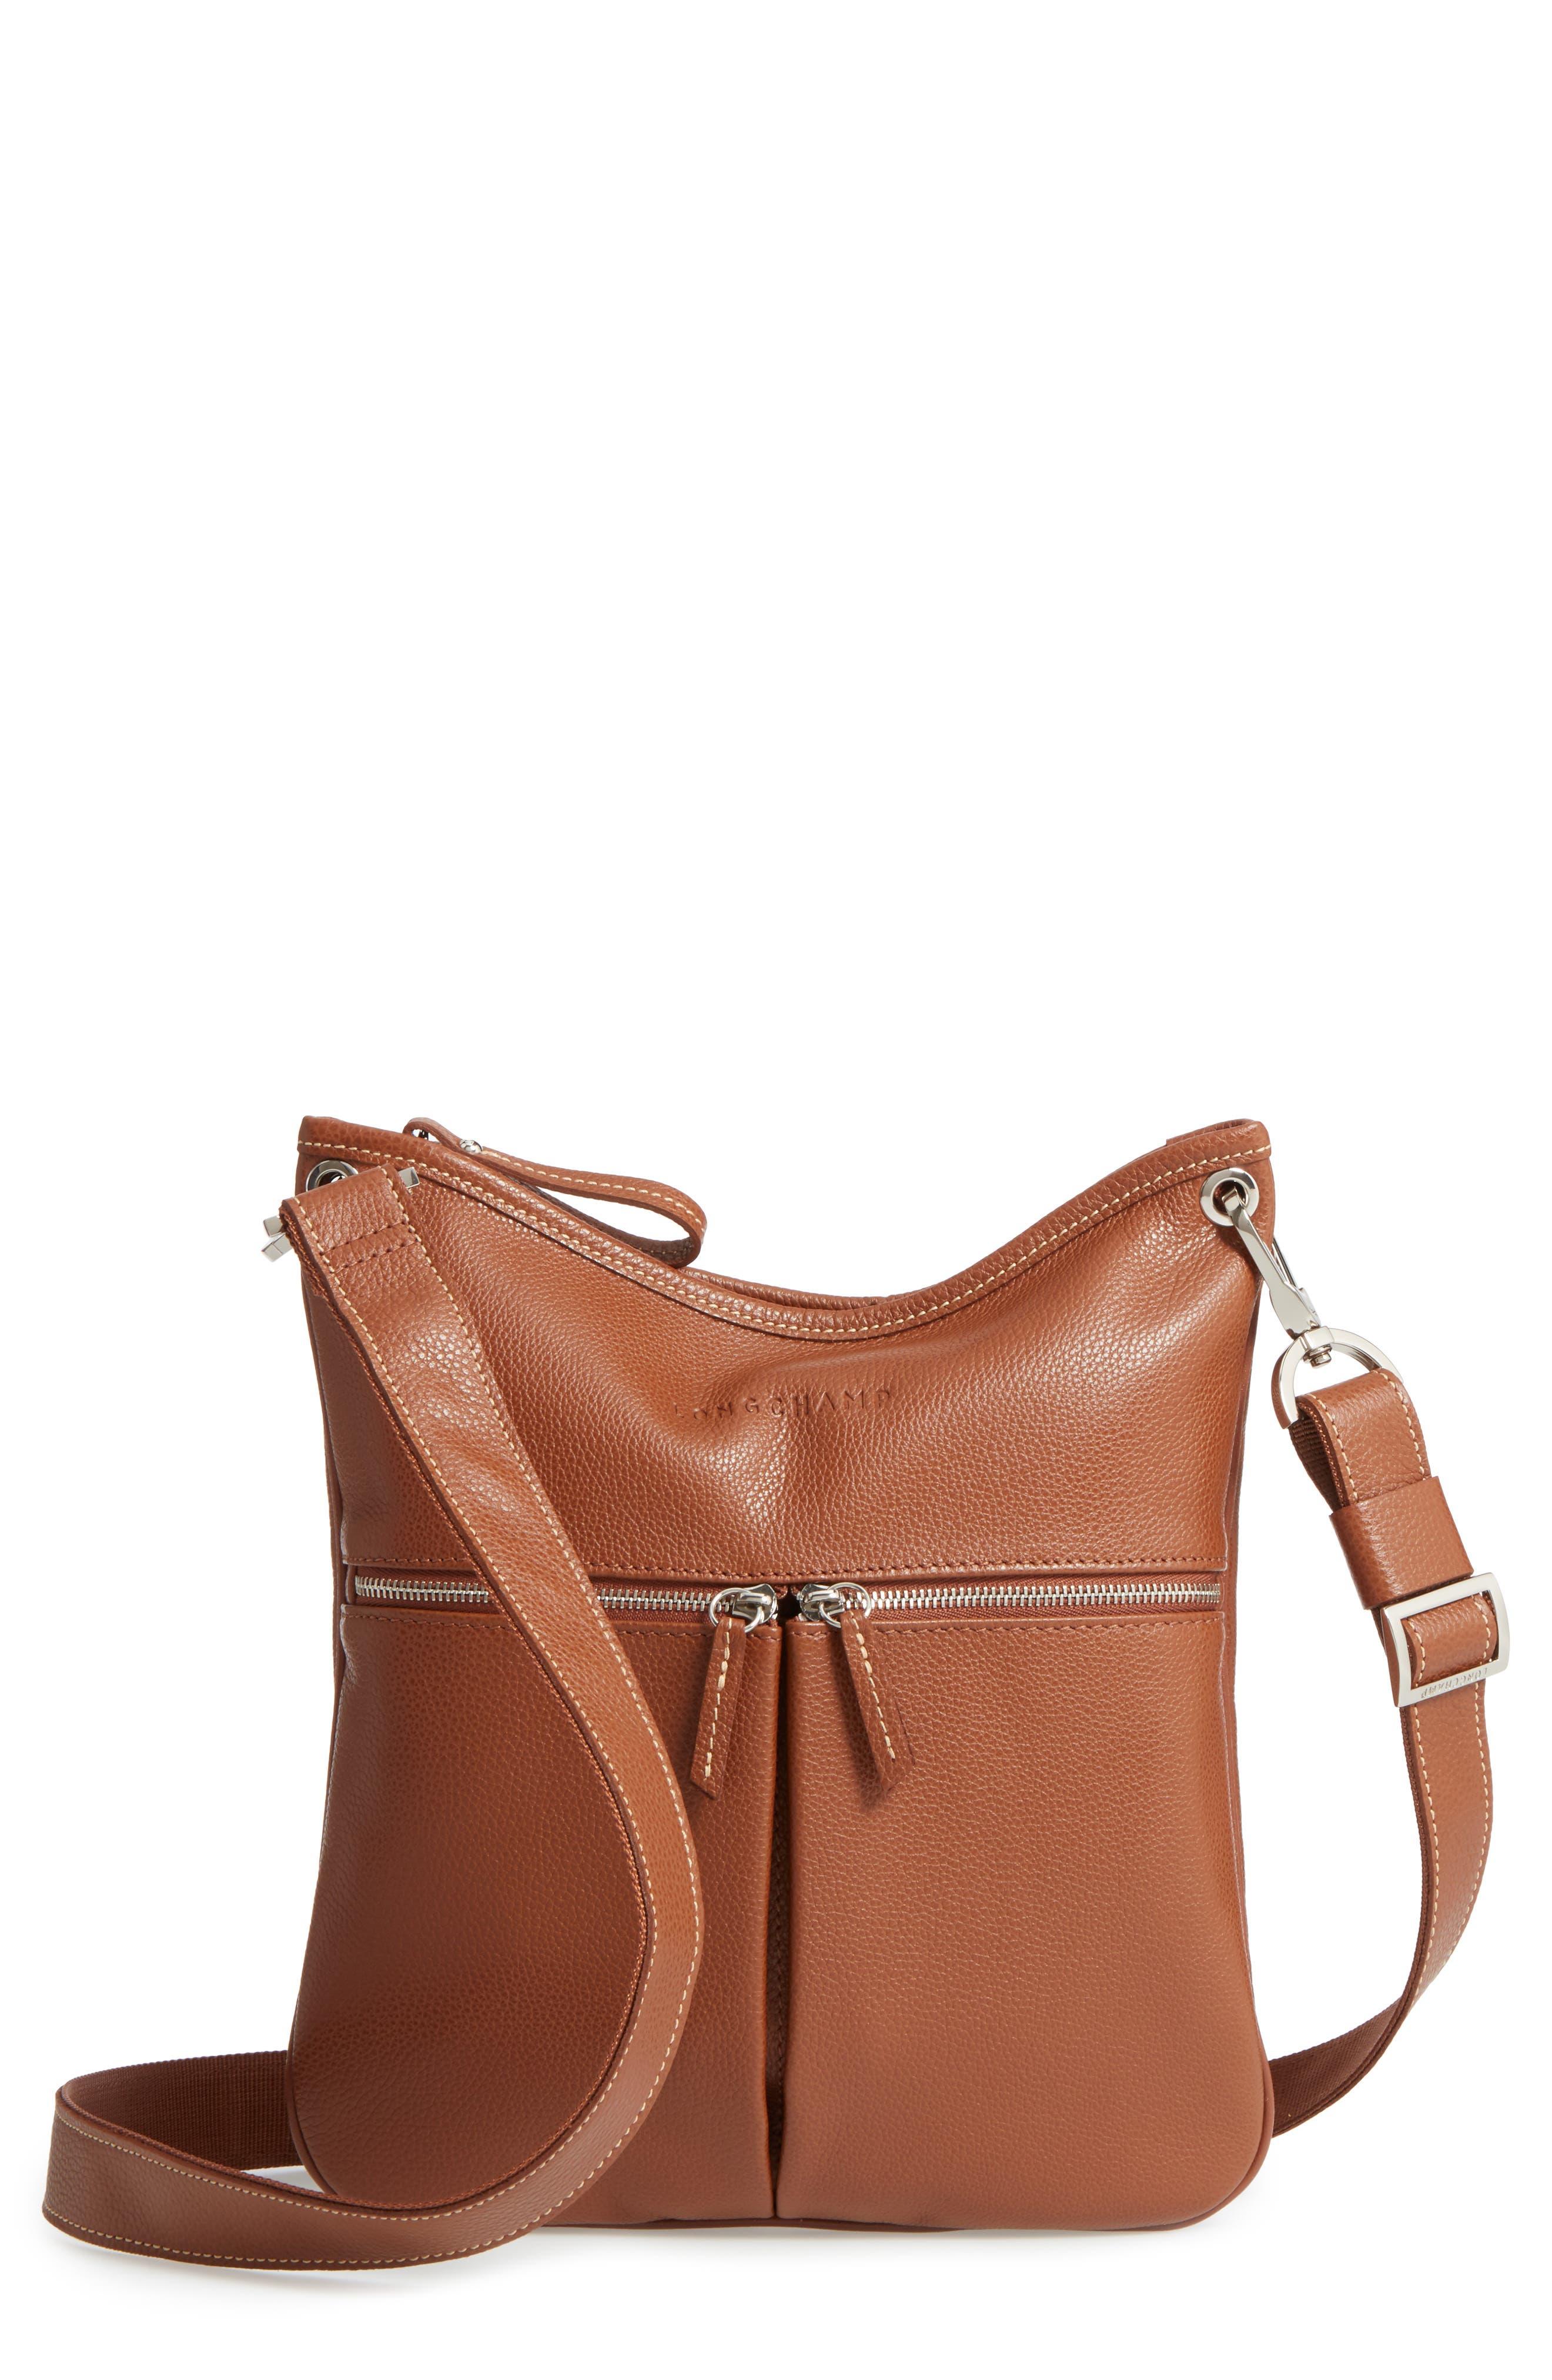 Longchamp 'Veau' Leather Crossbody Bag